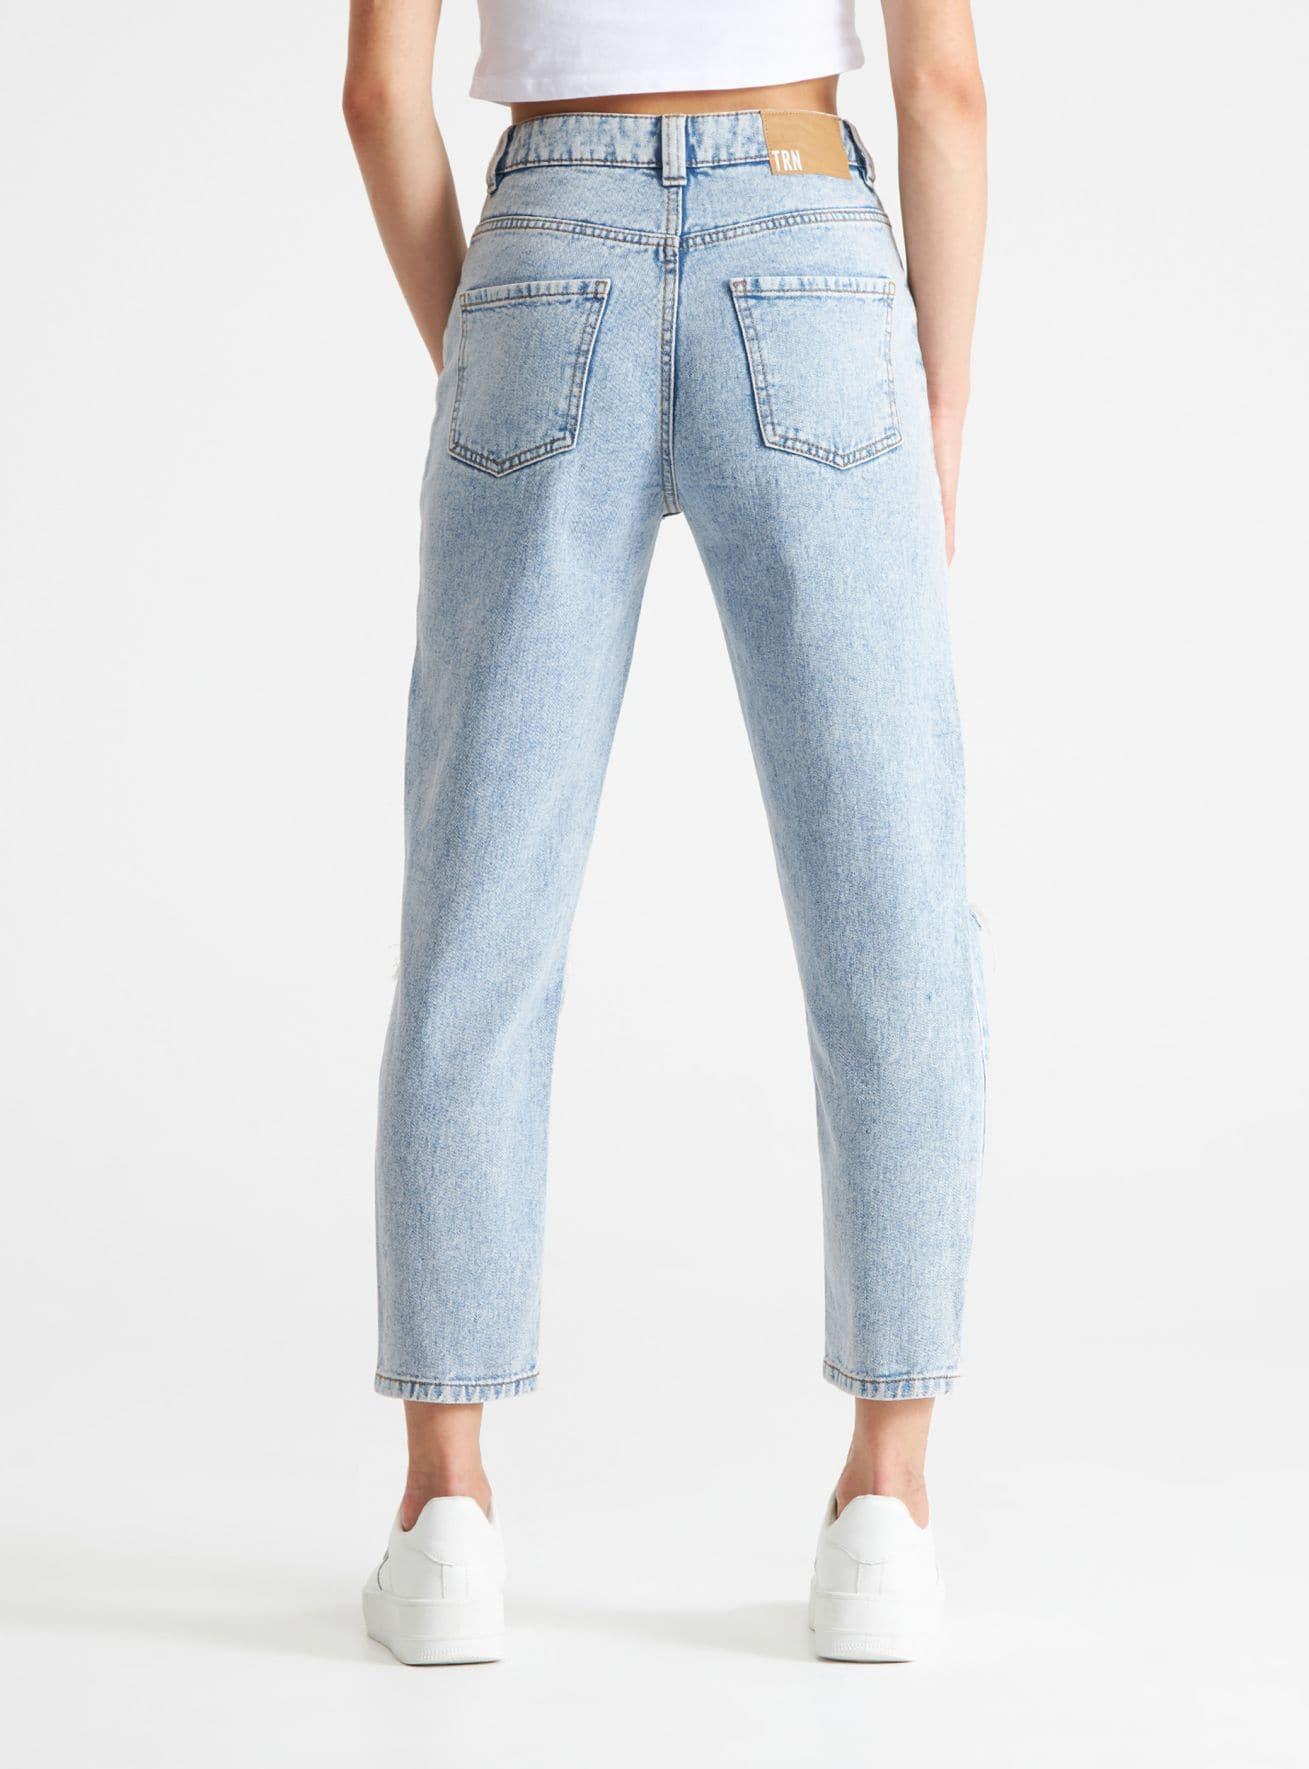 Pantalone Jeans Lungo Mujer Terranova